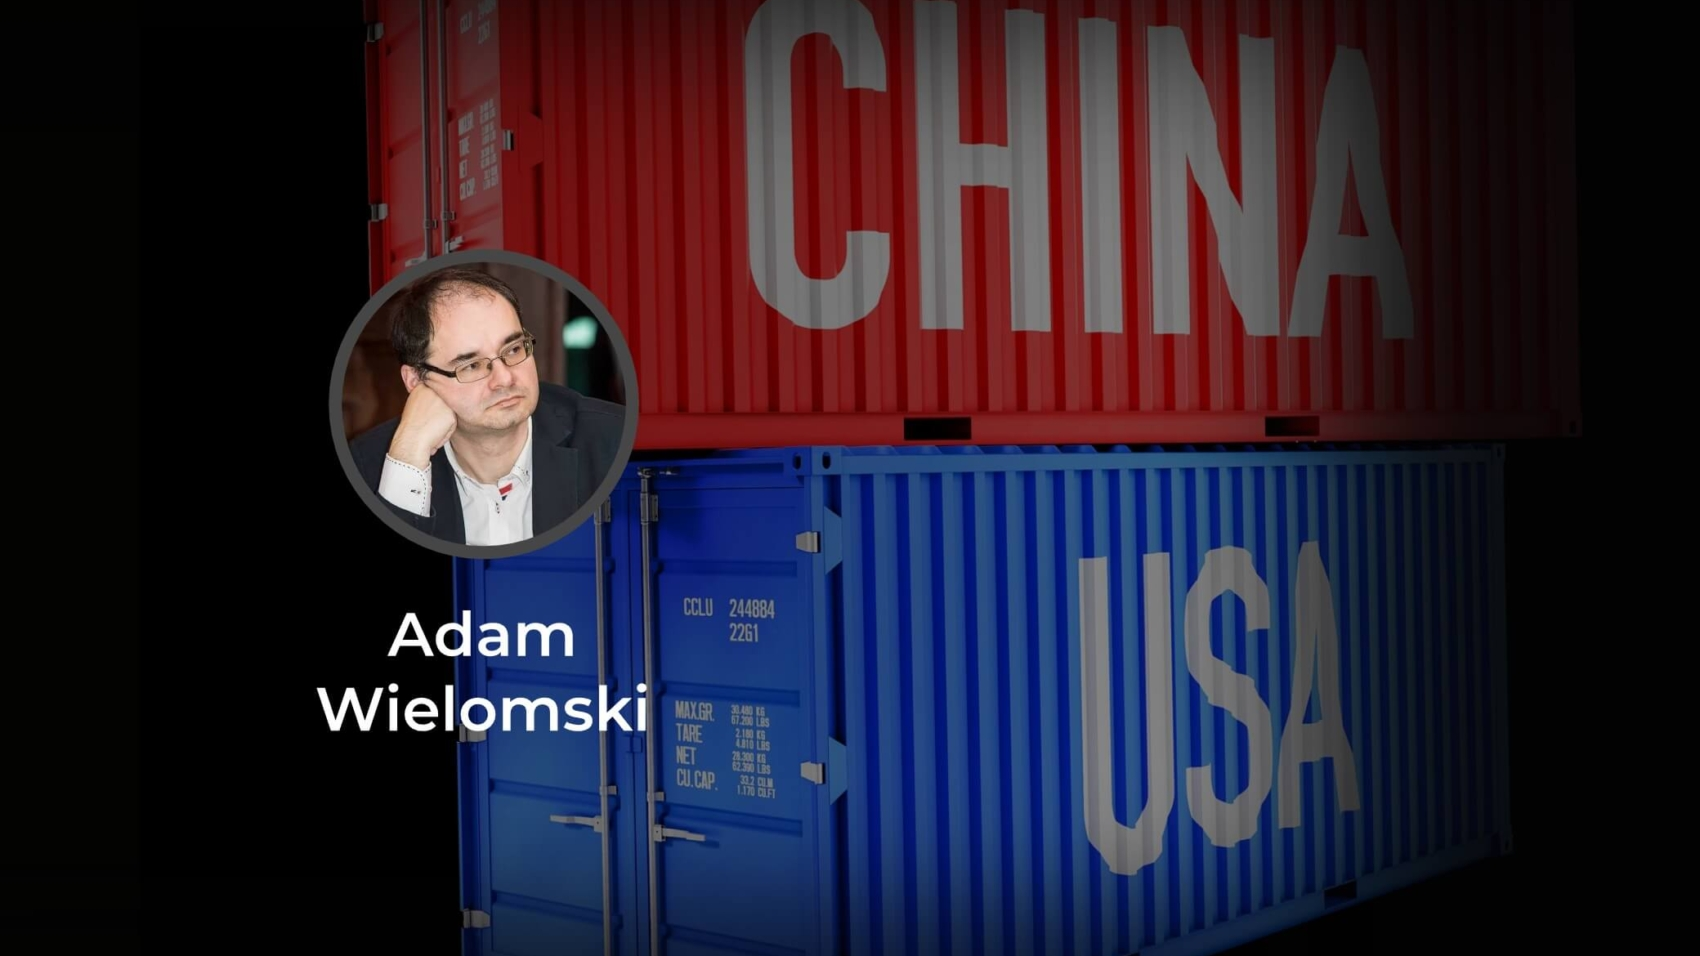 11-12-13-Adam-Wielomski